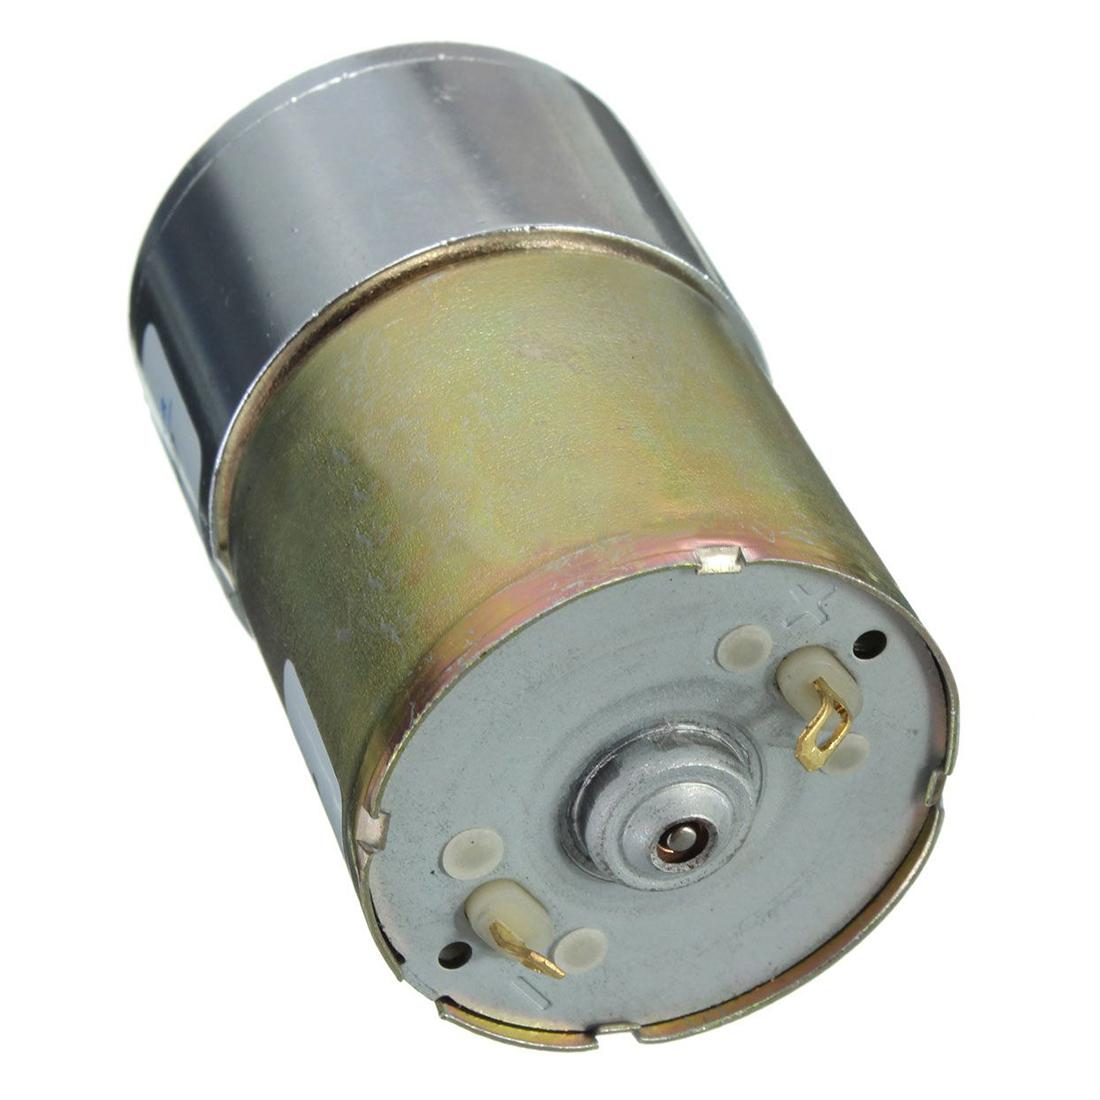 Zhengk 12v dc 300 rpm 37gb high torque gearbox electric for 300 rpm high torque dc motor